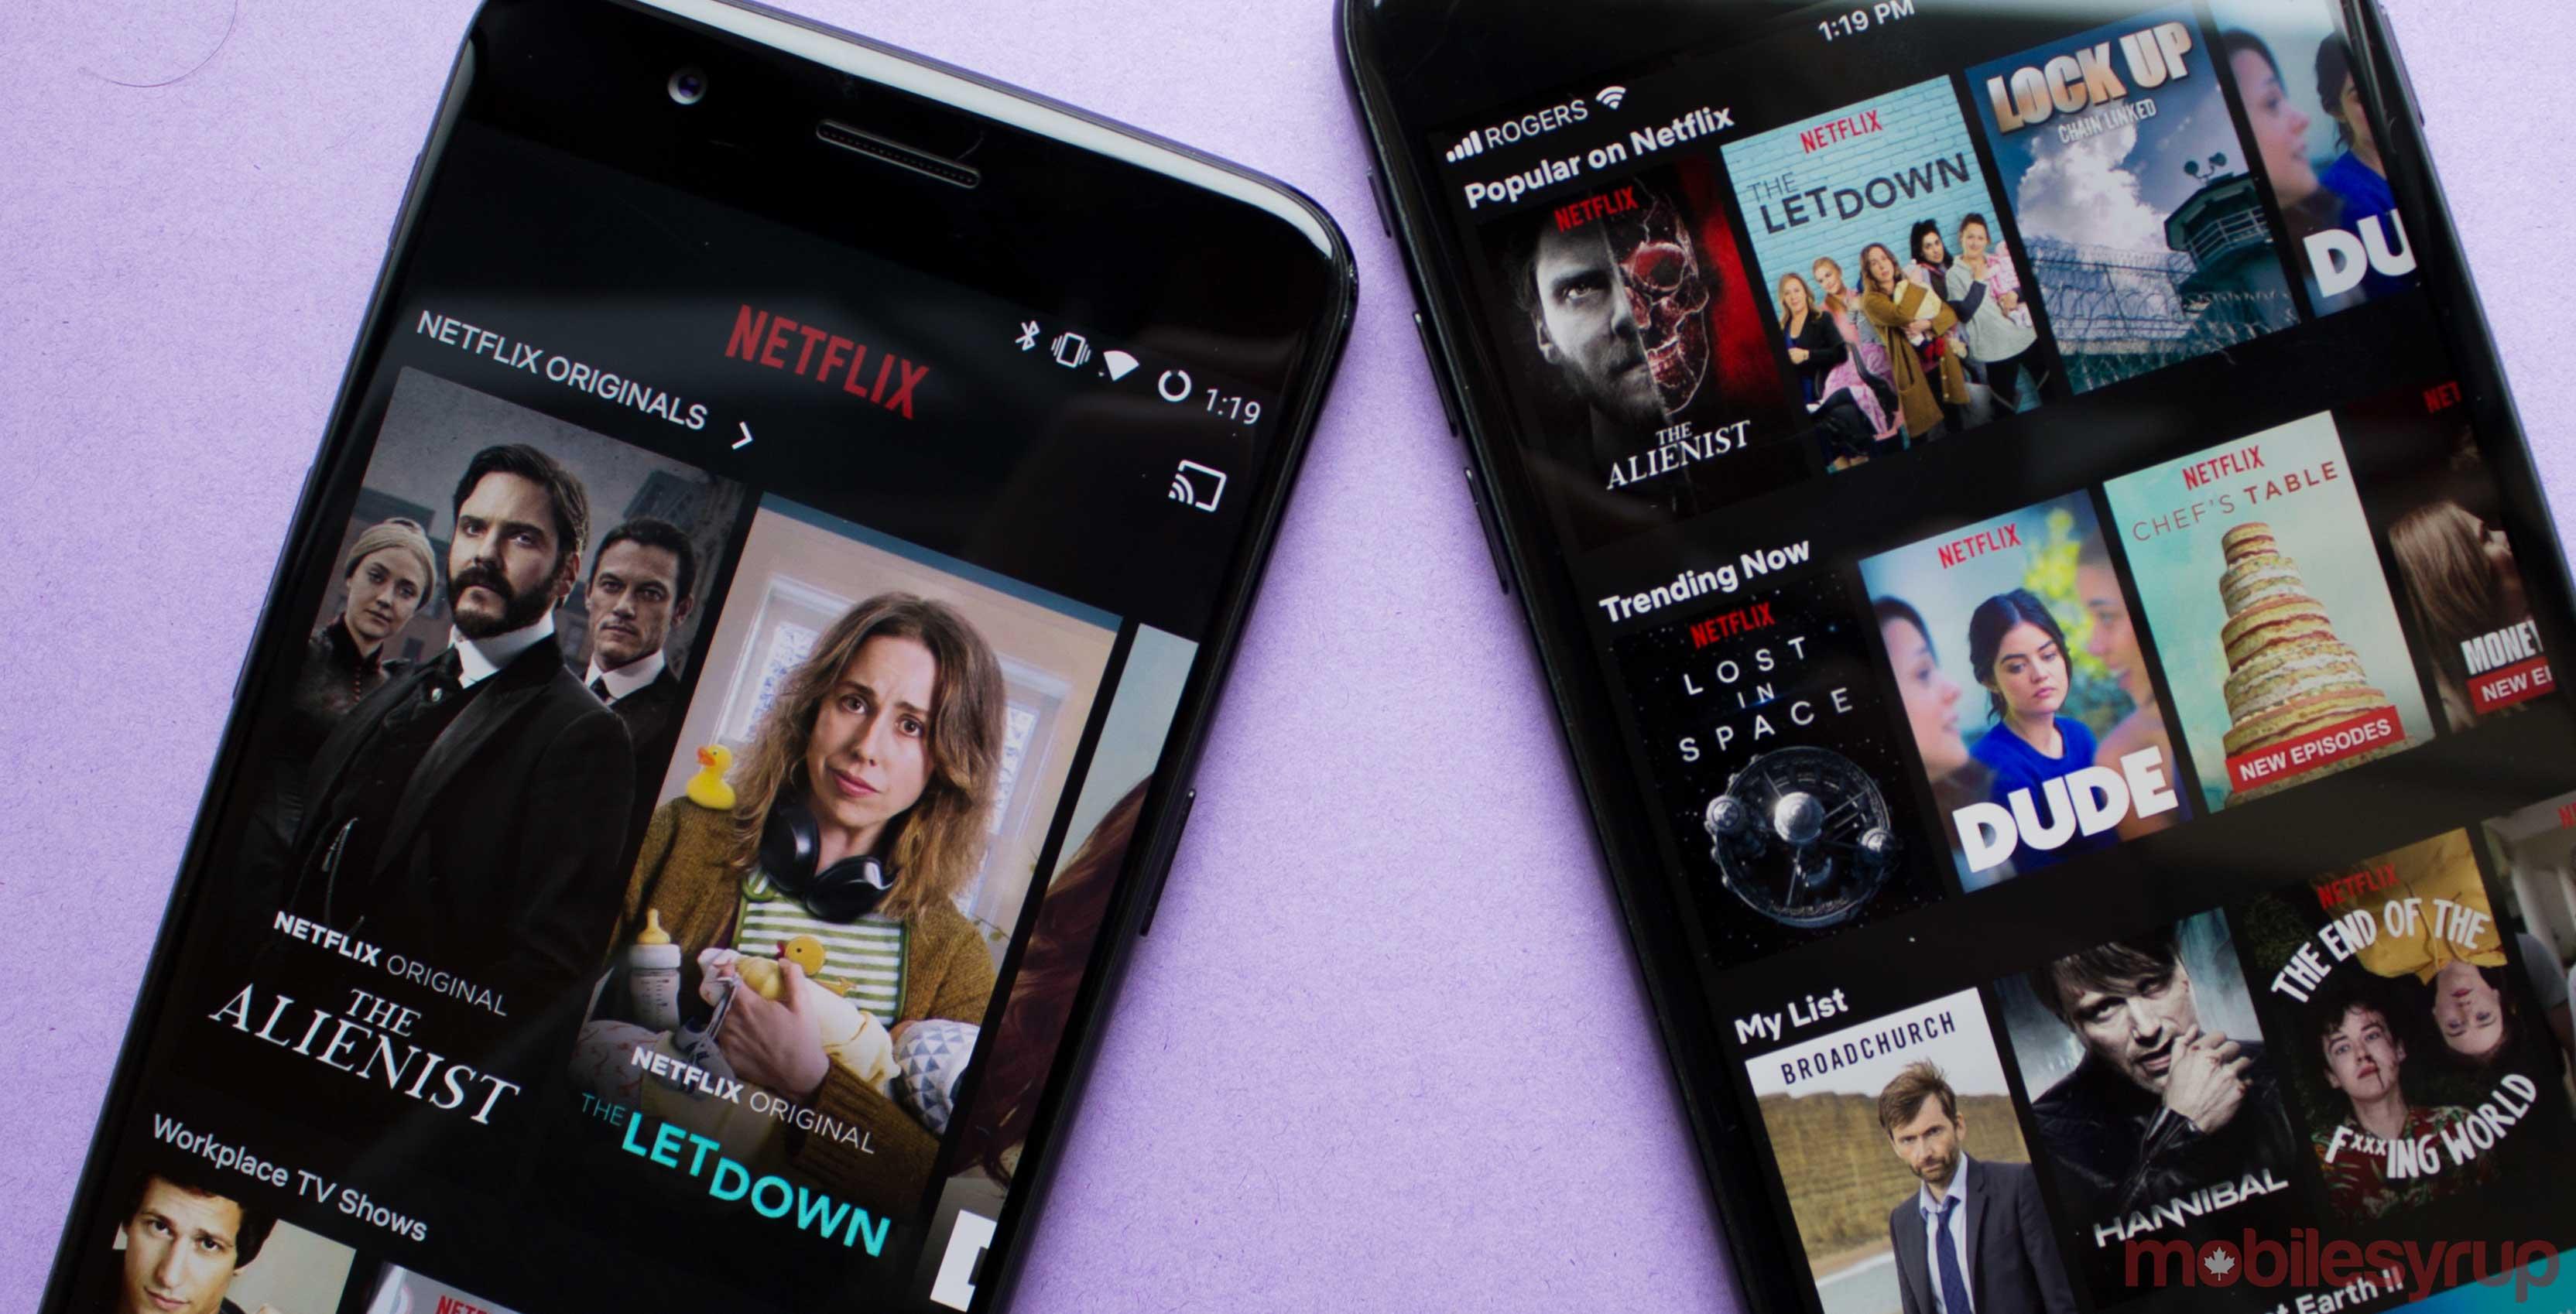 Netflix on phones